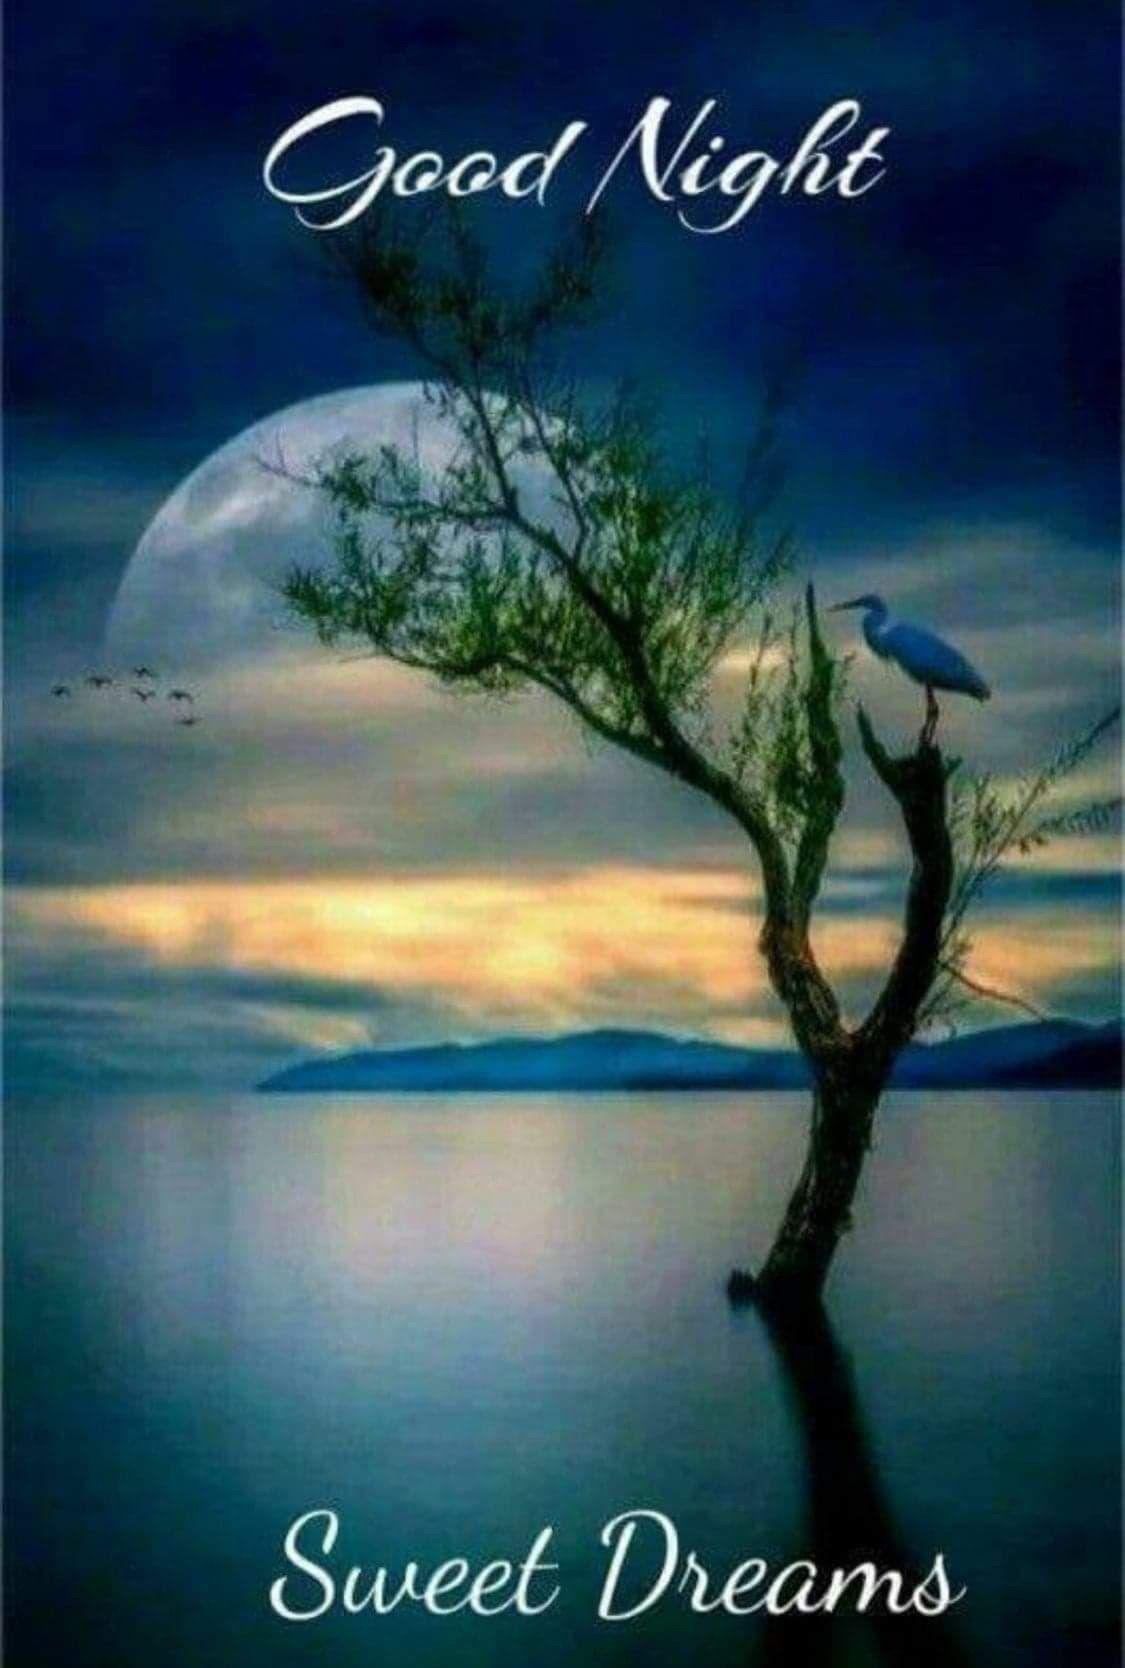 Good Night  Good night sweet dreams, Good night blessings, Good